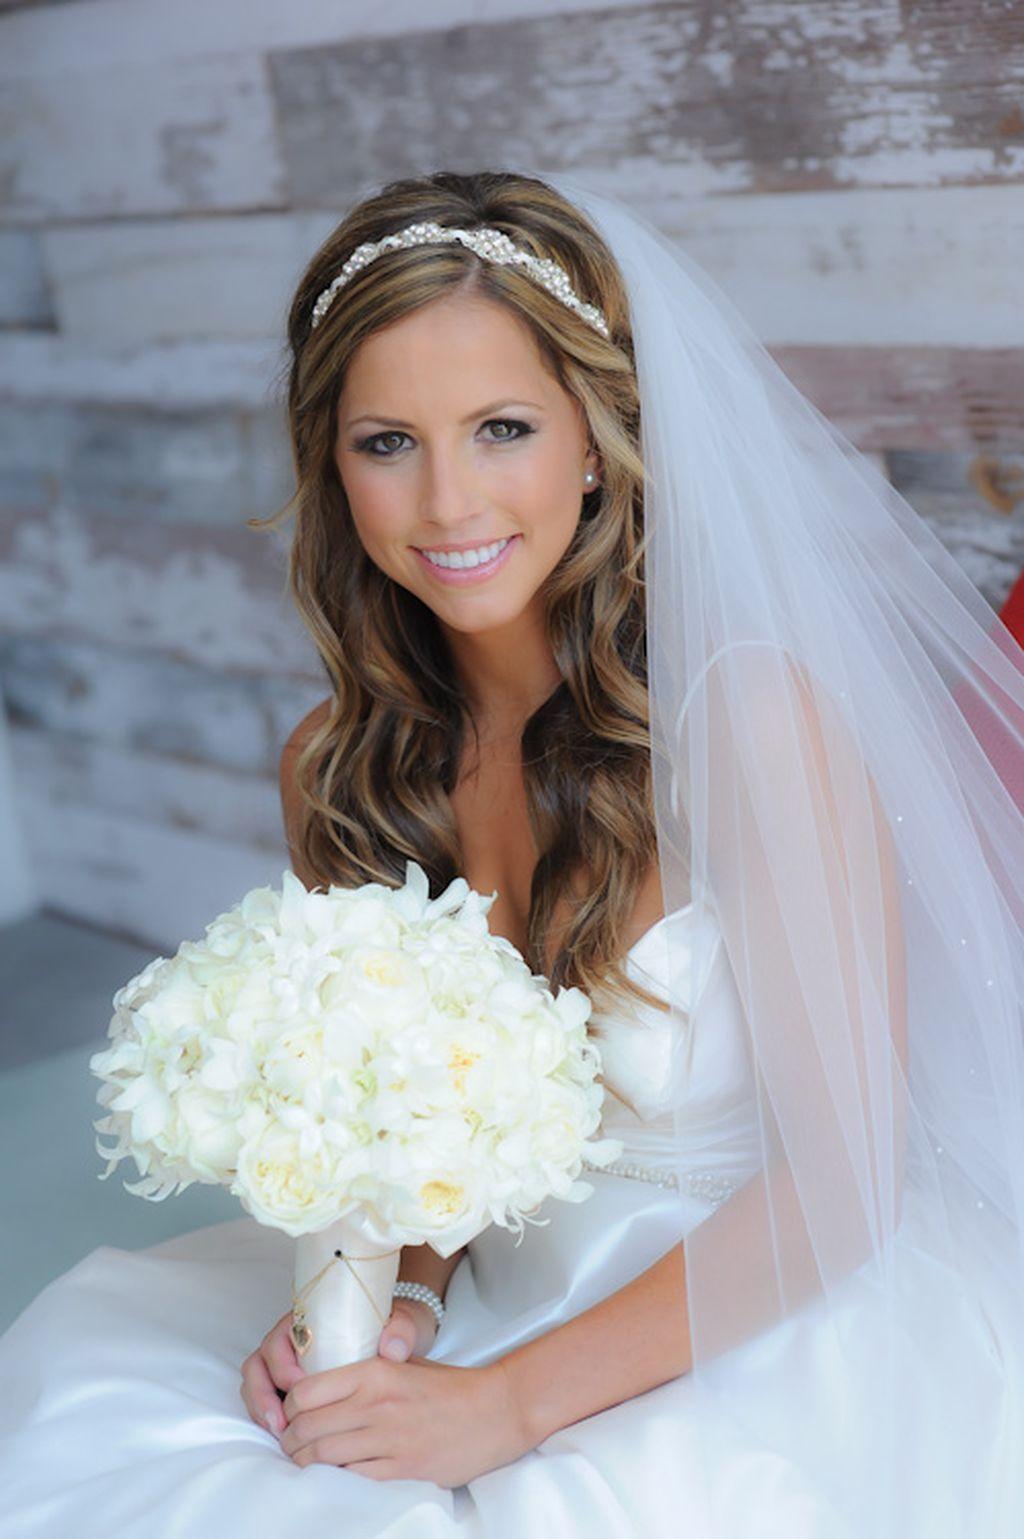 beautiful wedding hair down style ideas with headband